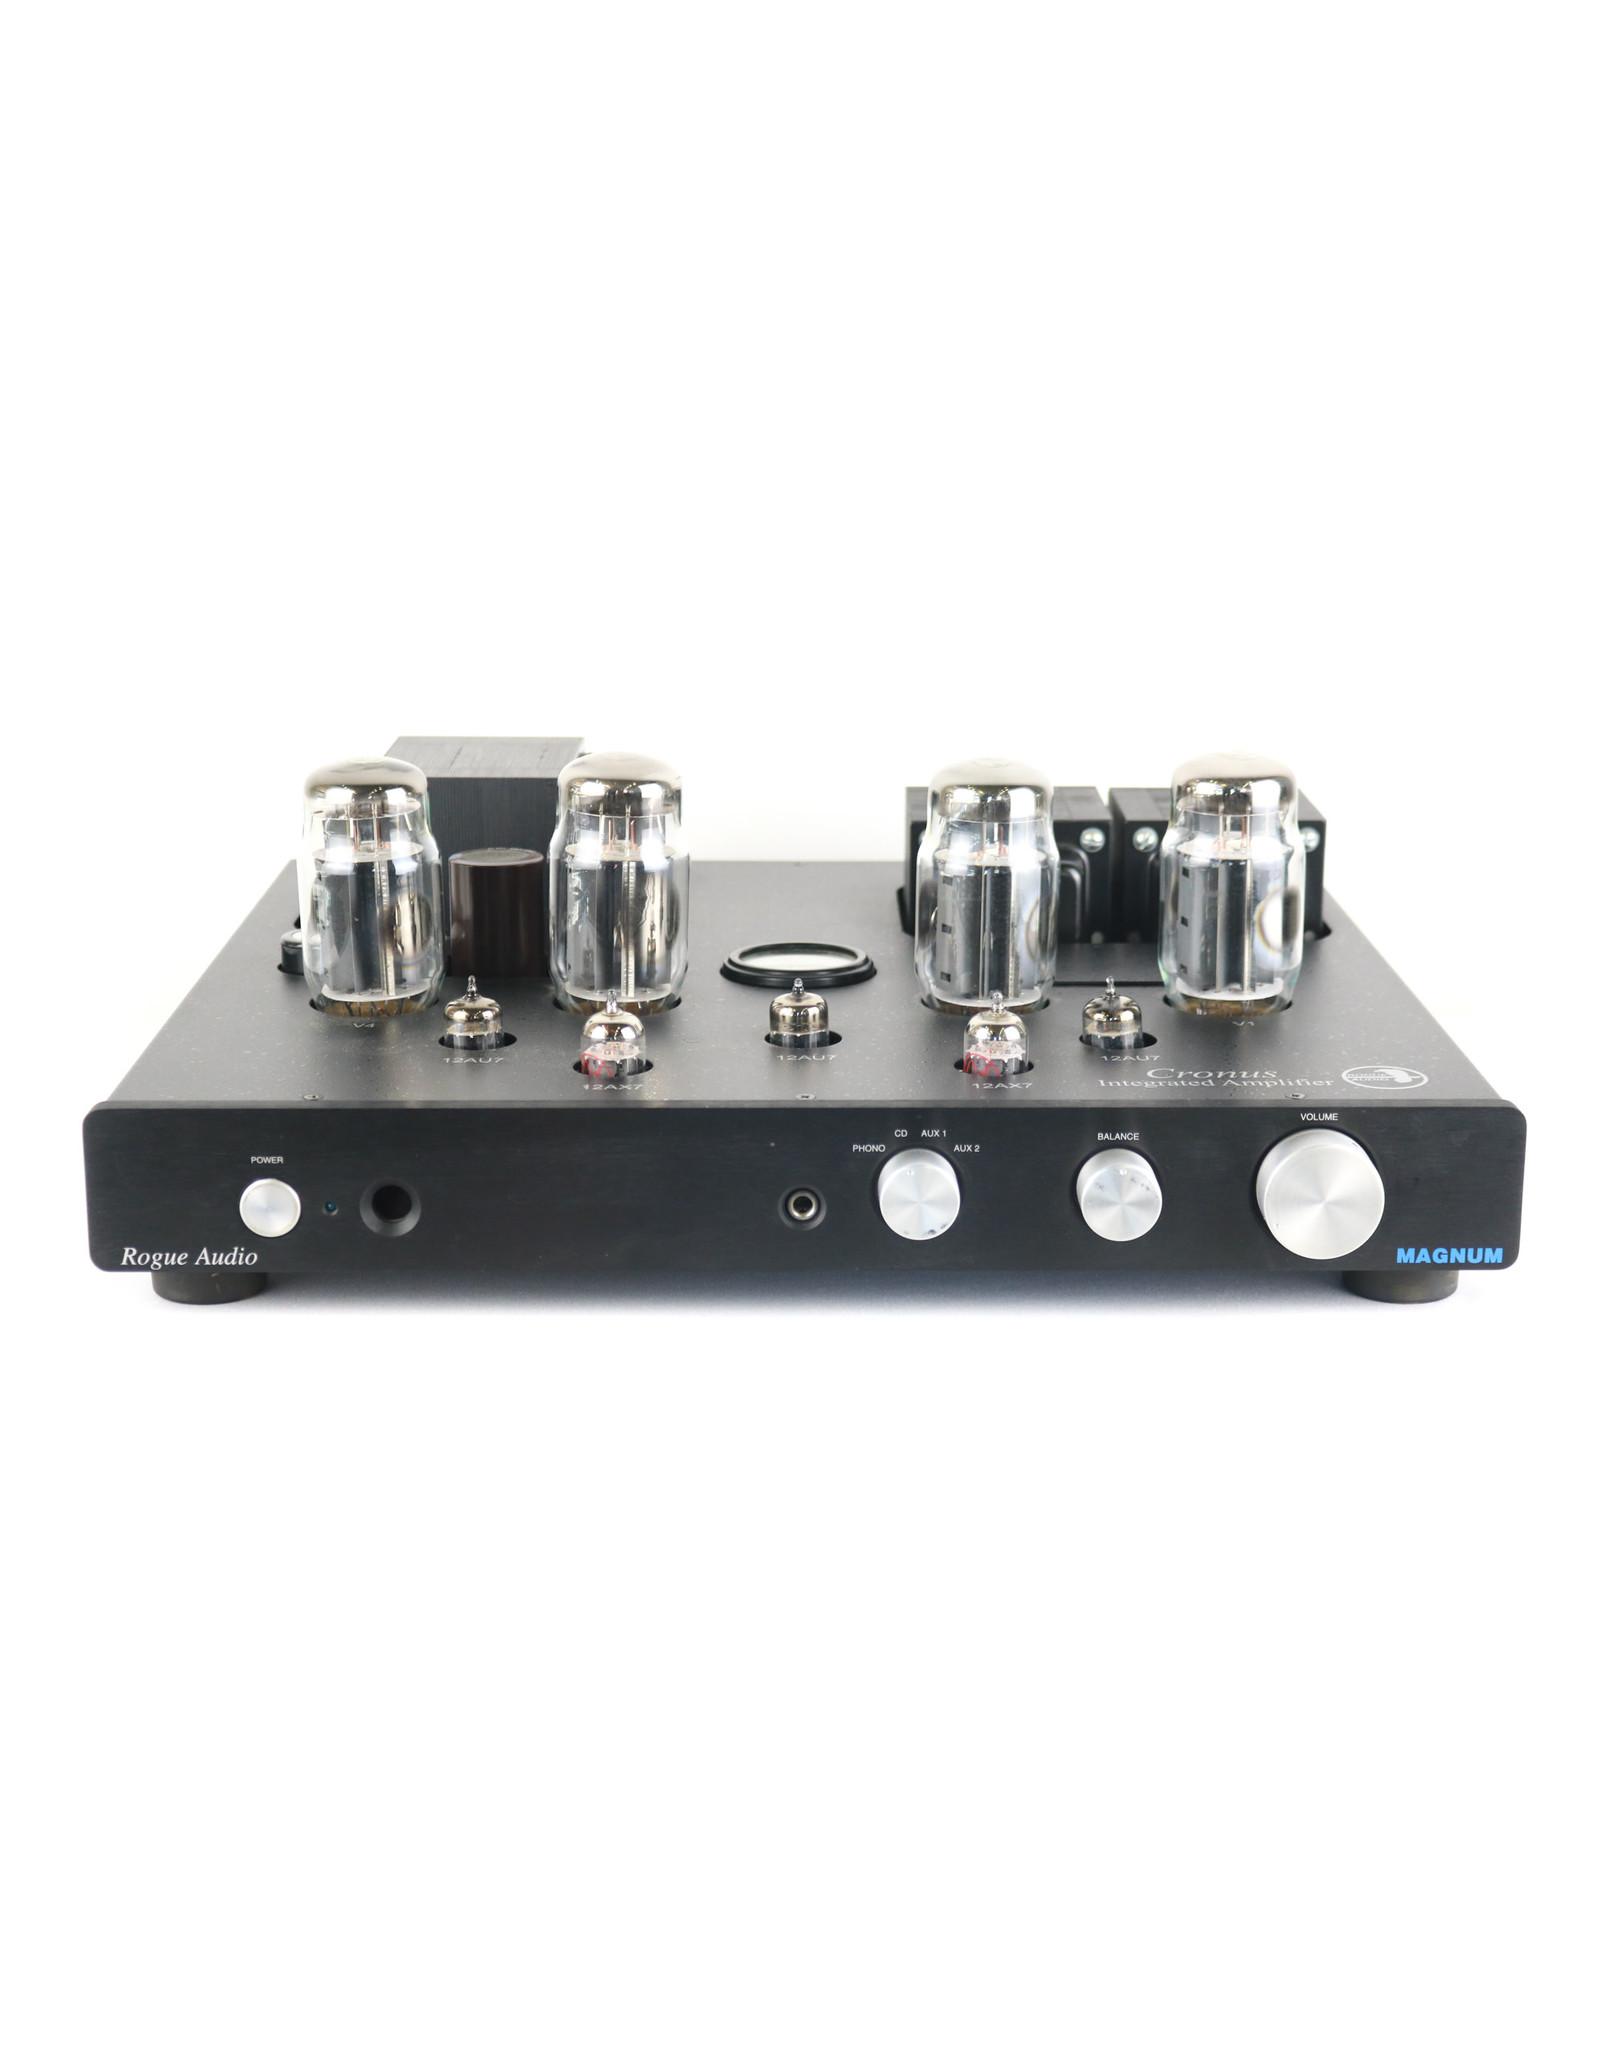 Rogue Audio Rogue Audio Cronus Magnum Tube Integrated Amp USED